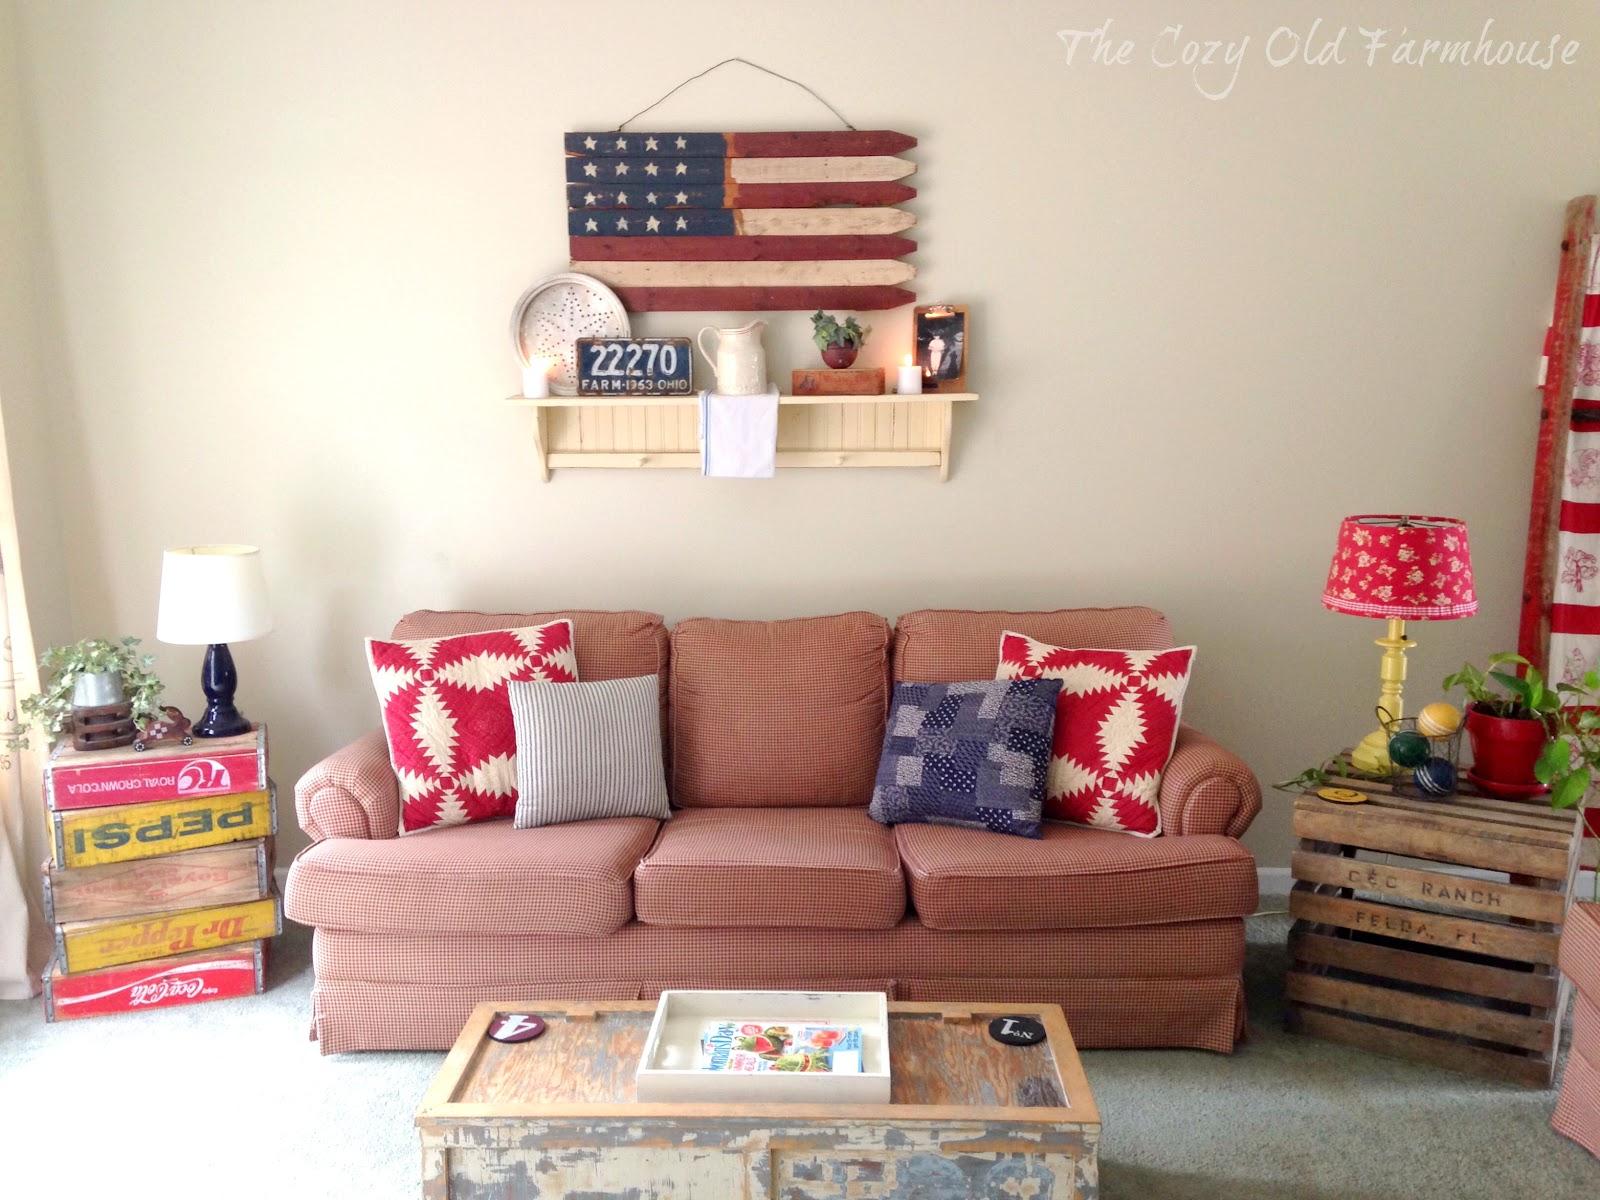 The Cozy Old Farmhouse Summer Living Room Decor